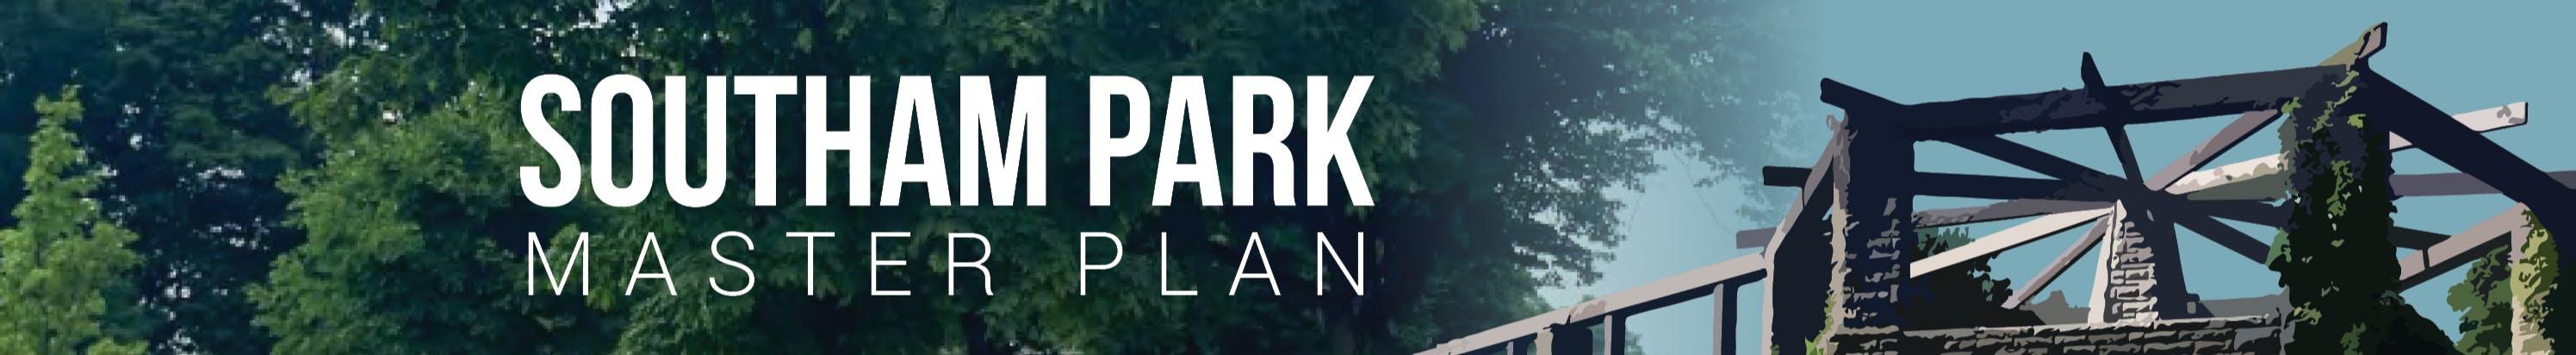 Southam Park Master Plan